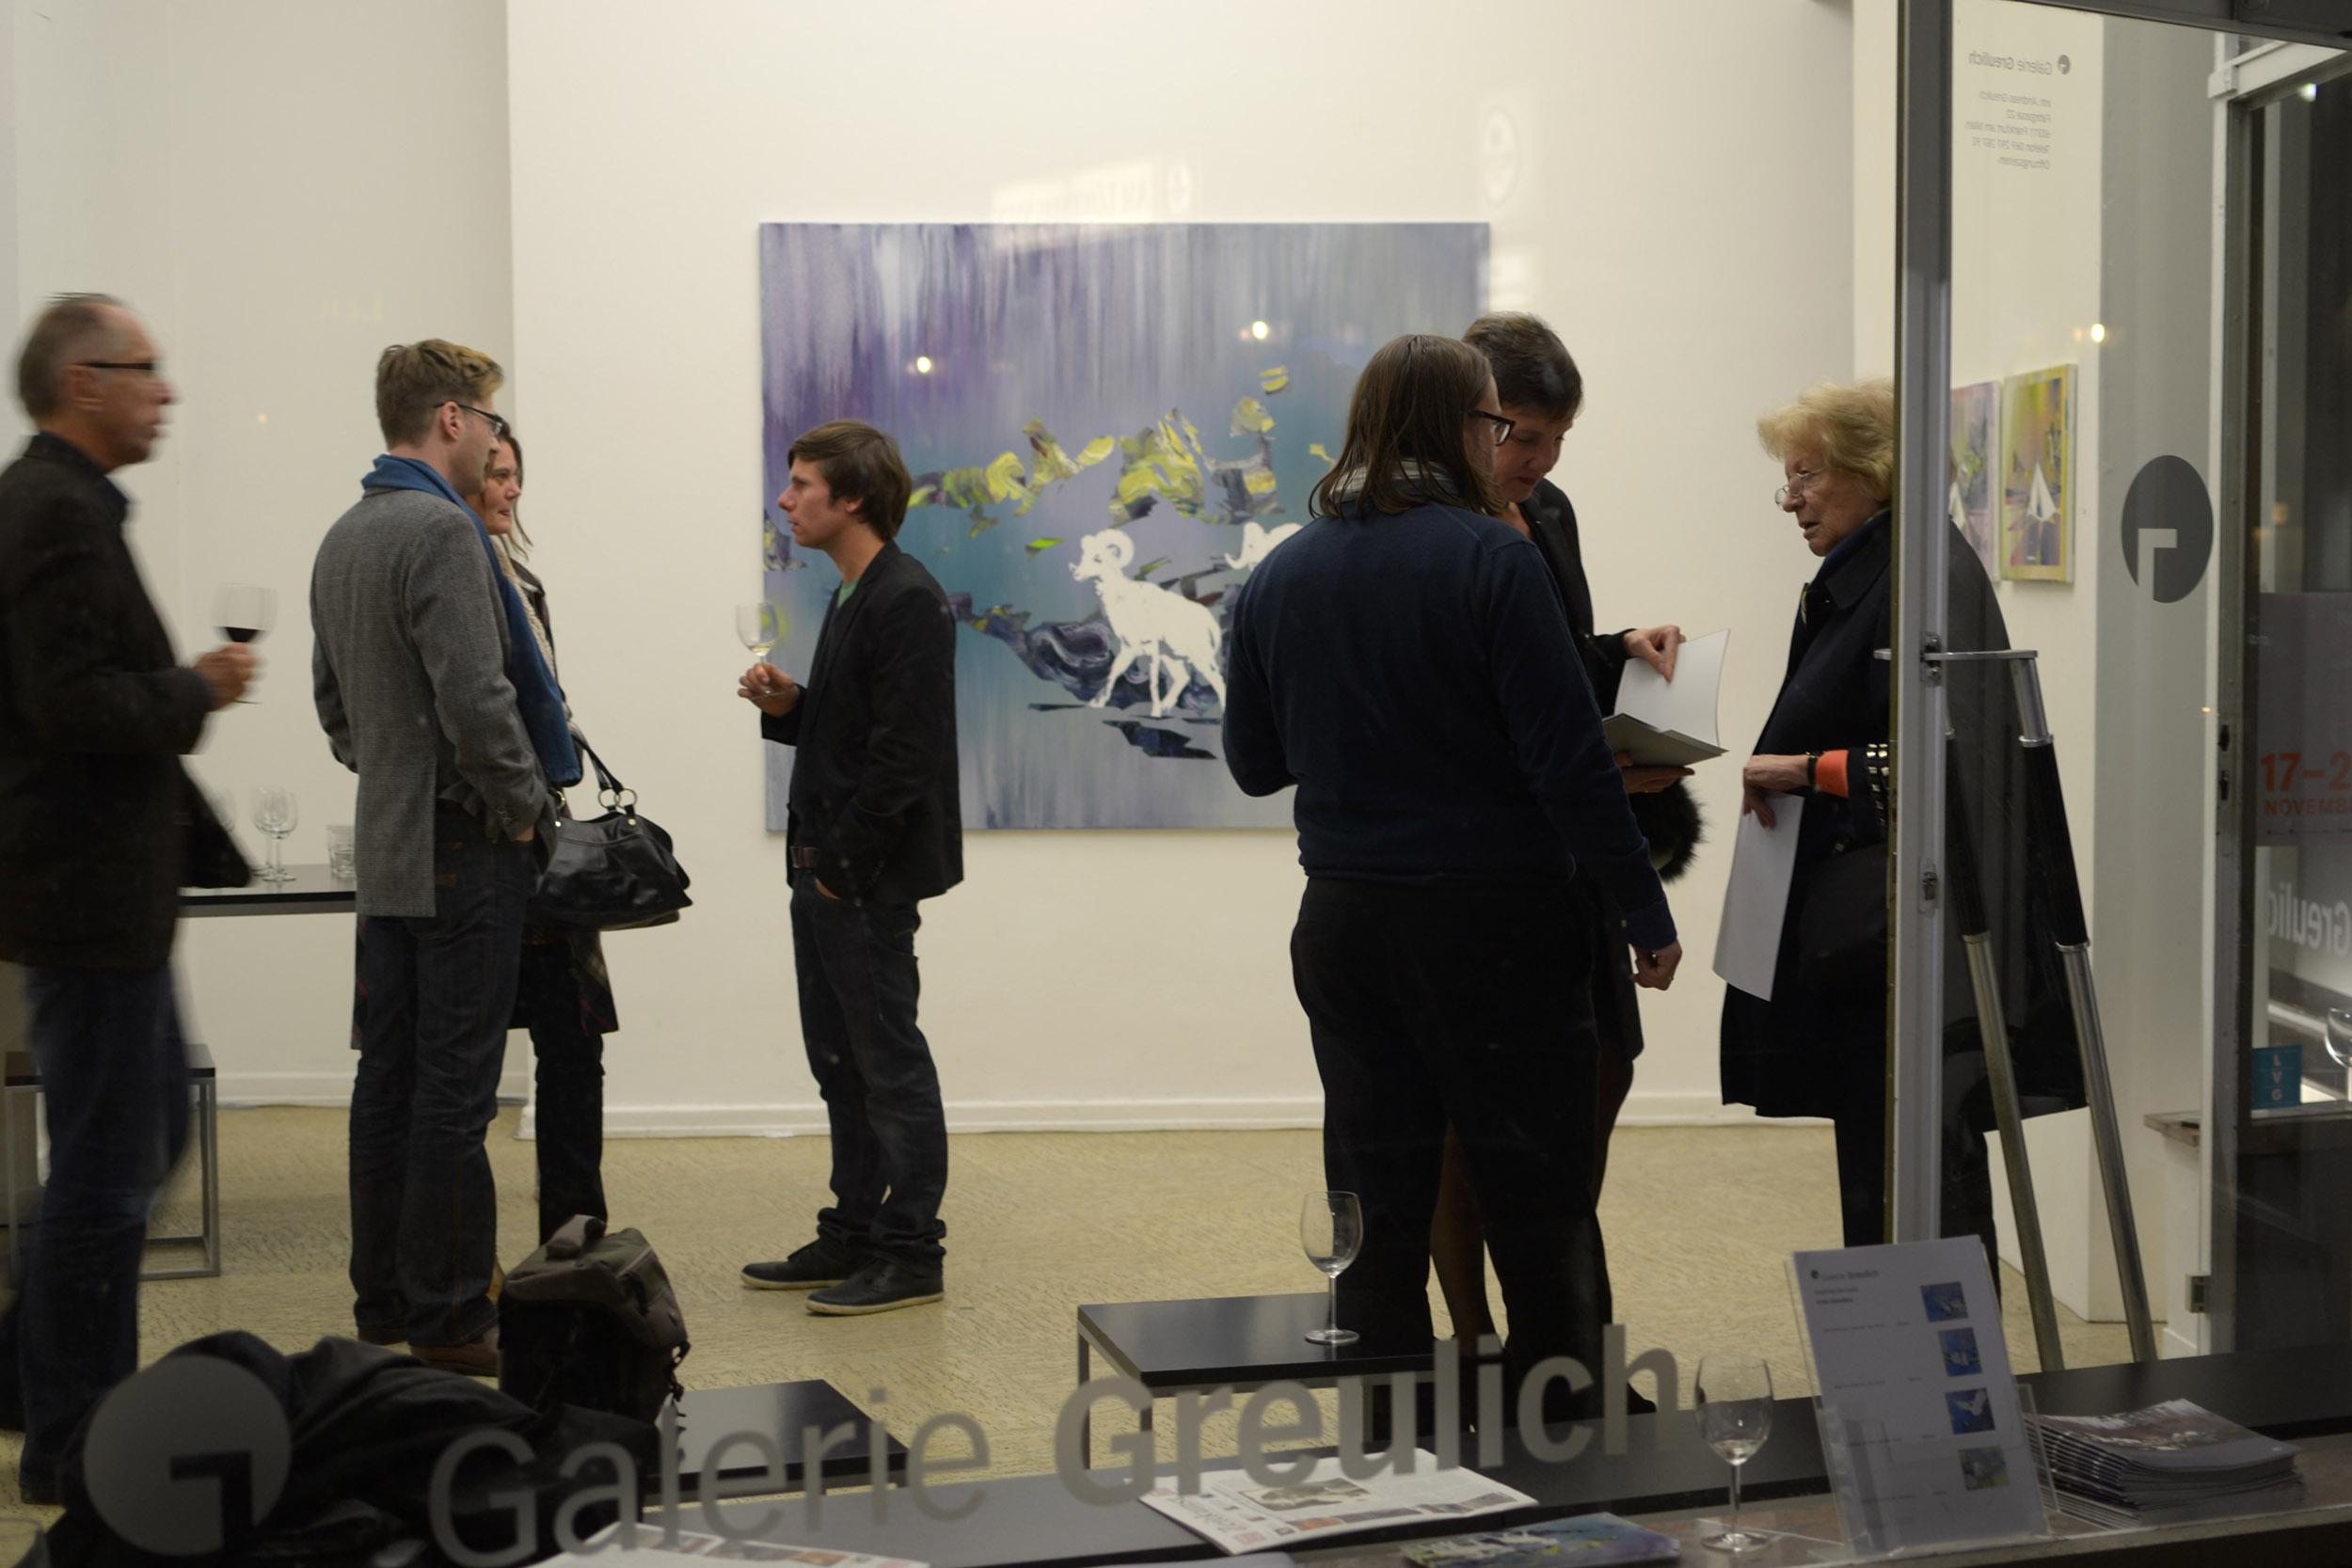 Gran Paradiso  Galerie Greulich Frankfurt/Main, 2011